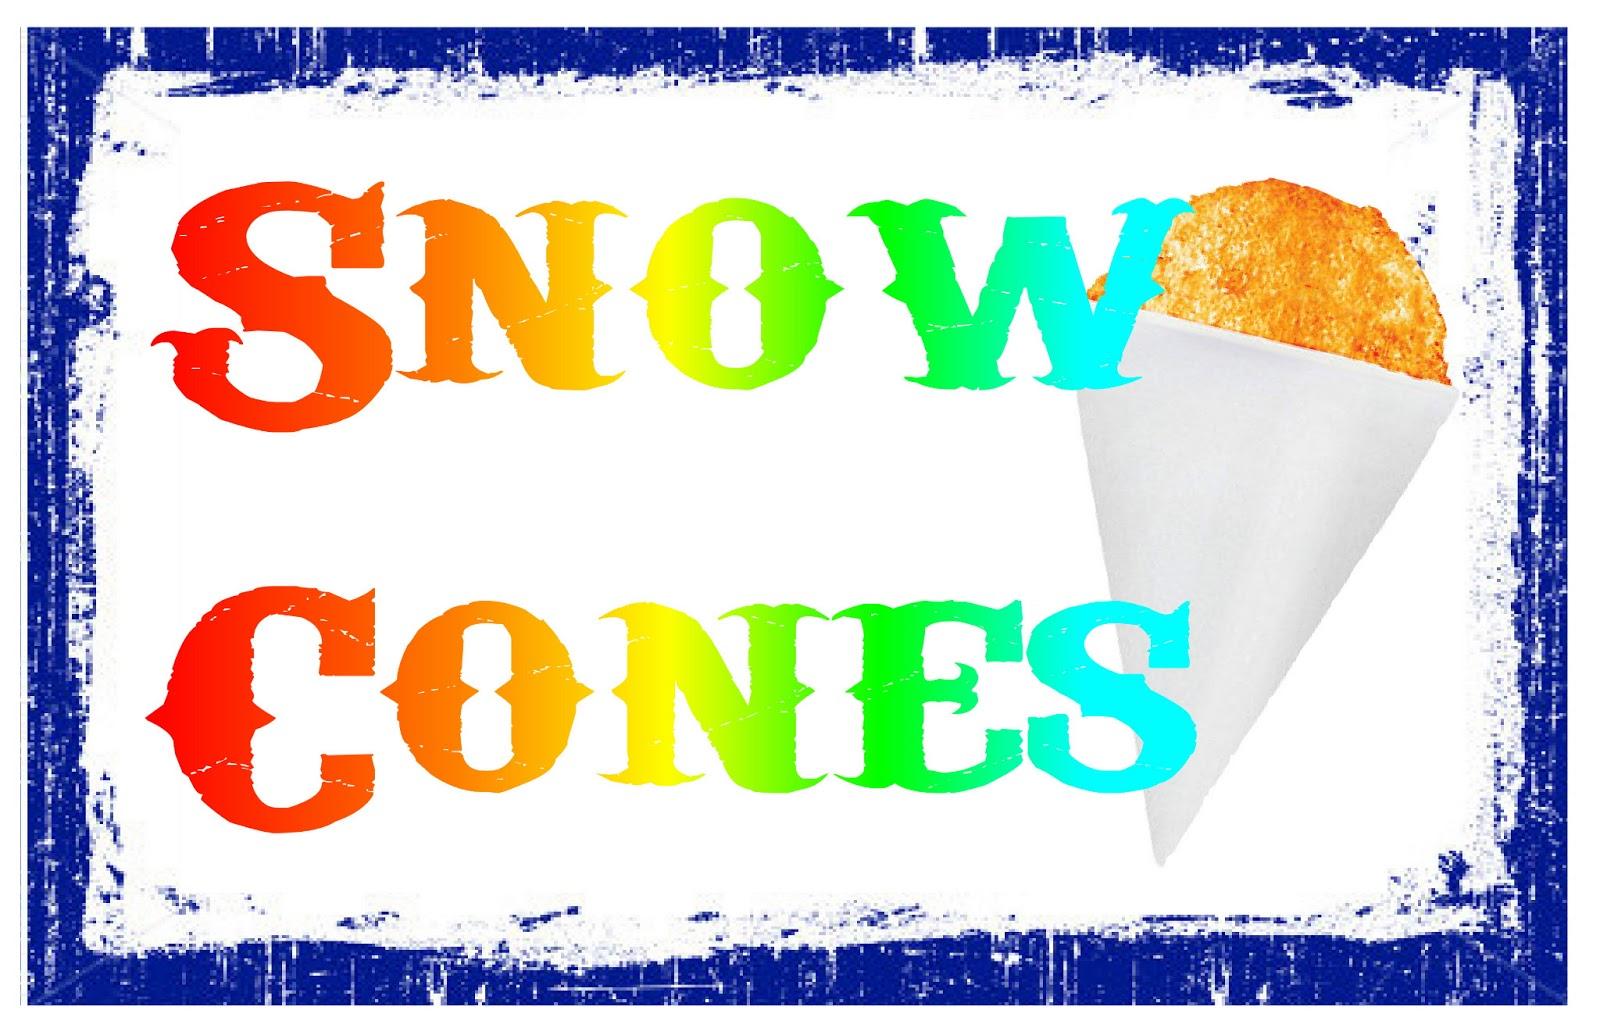 free clipart of snow cones - photo #38